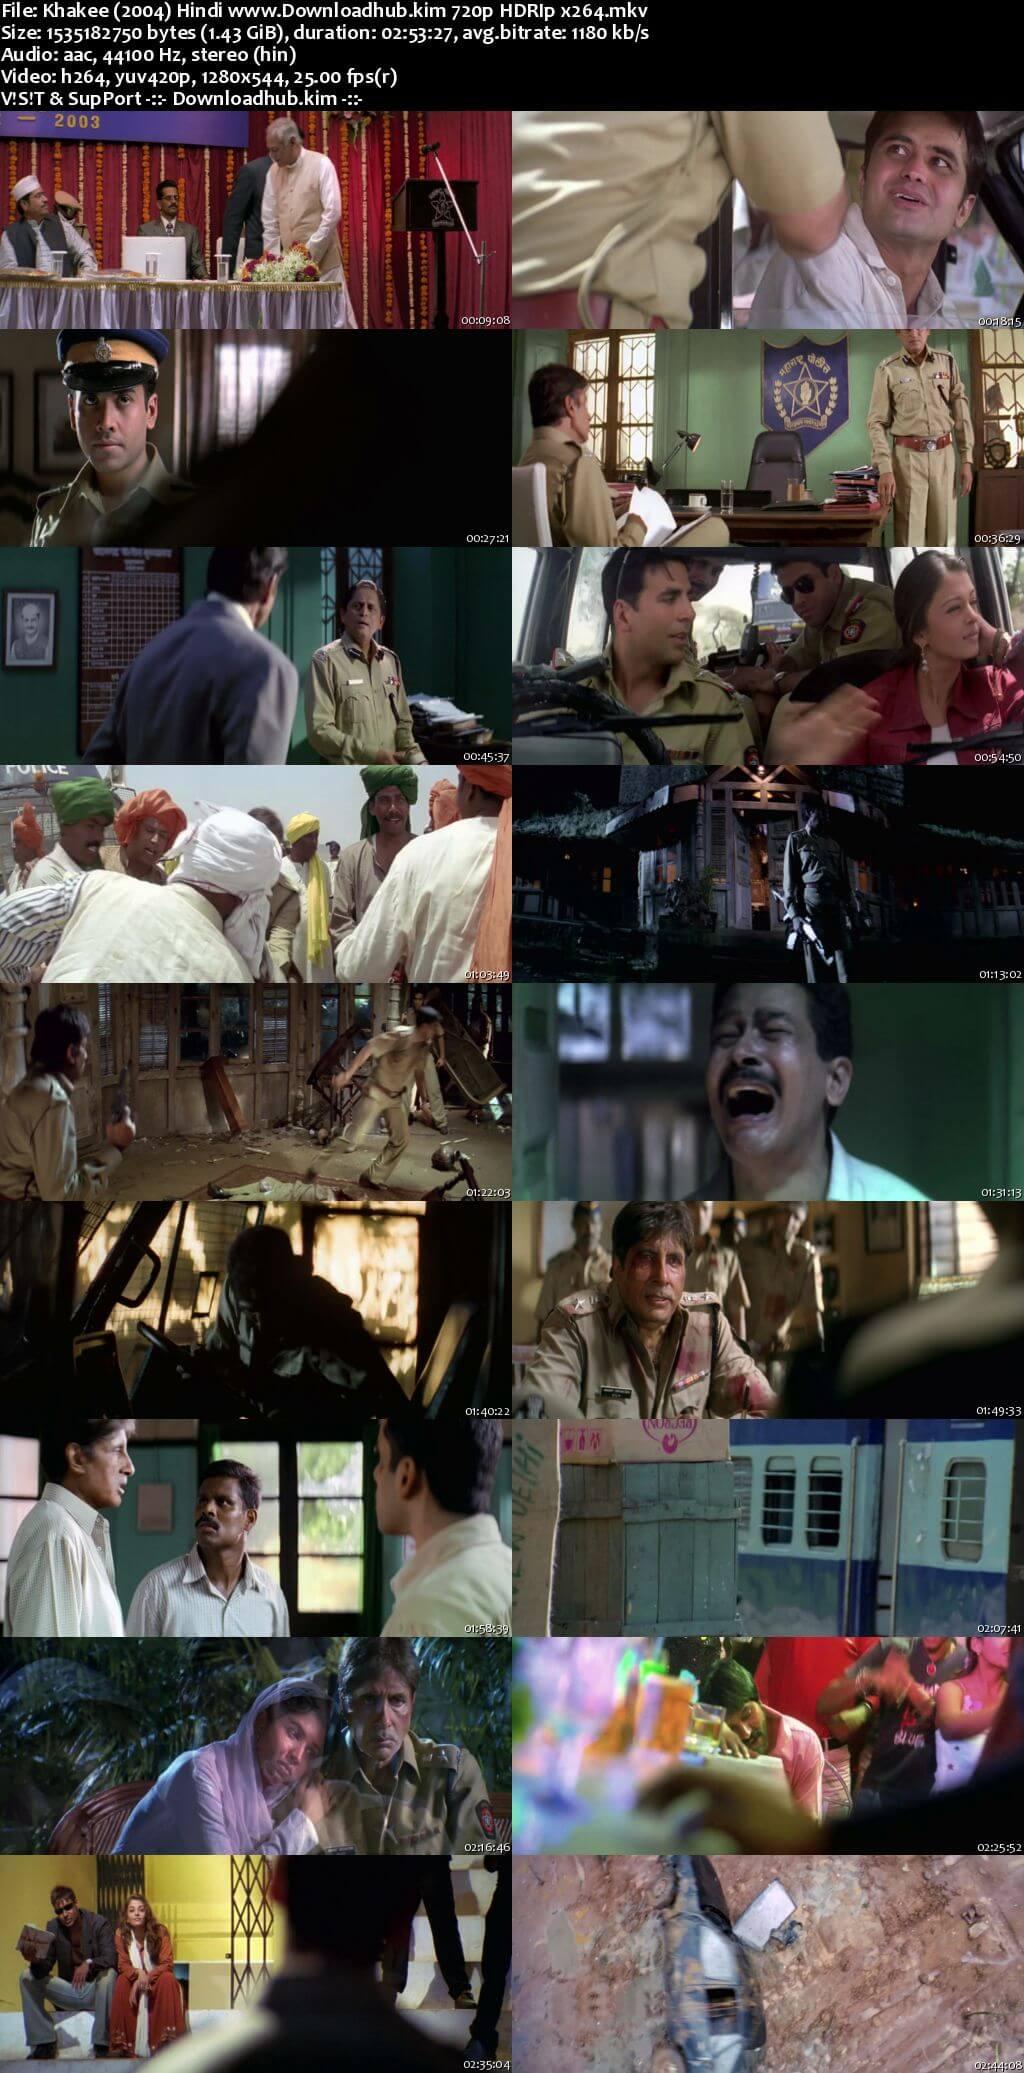 Khakee 2004 Hindi 720p HDRip x264